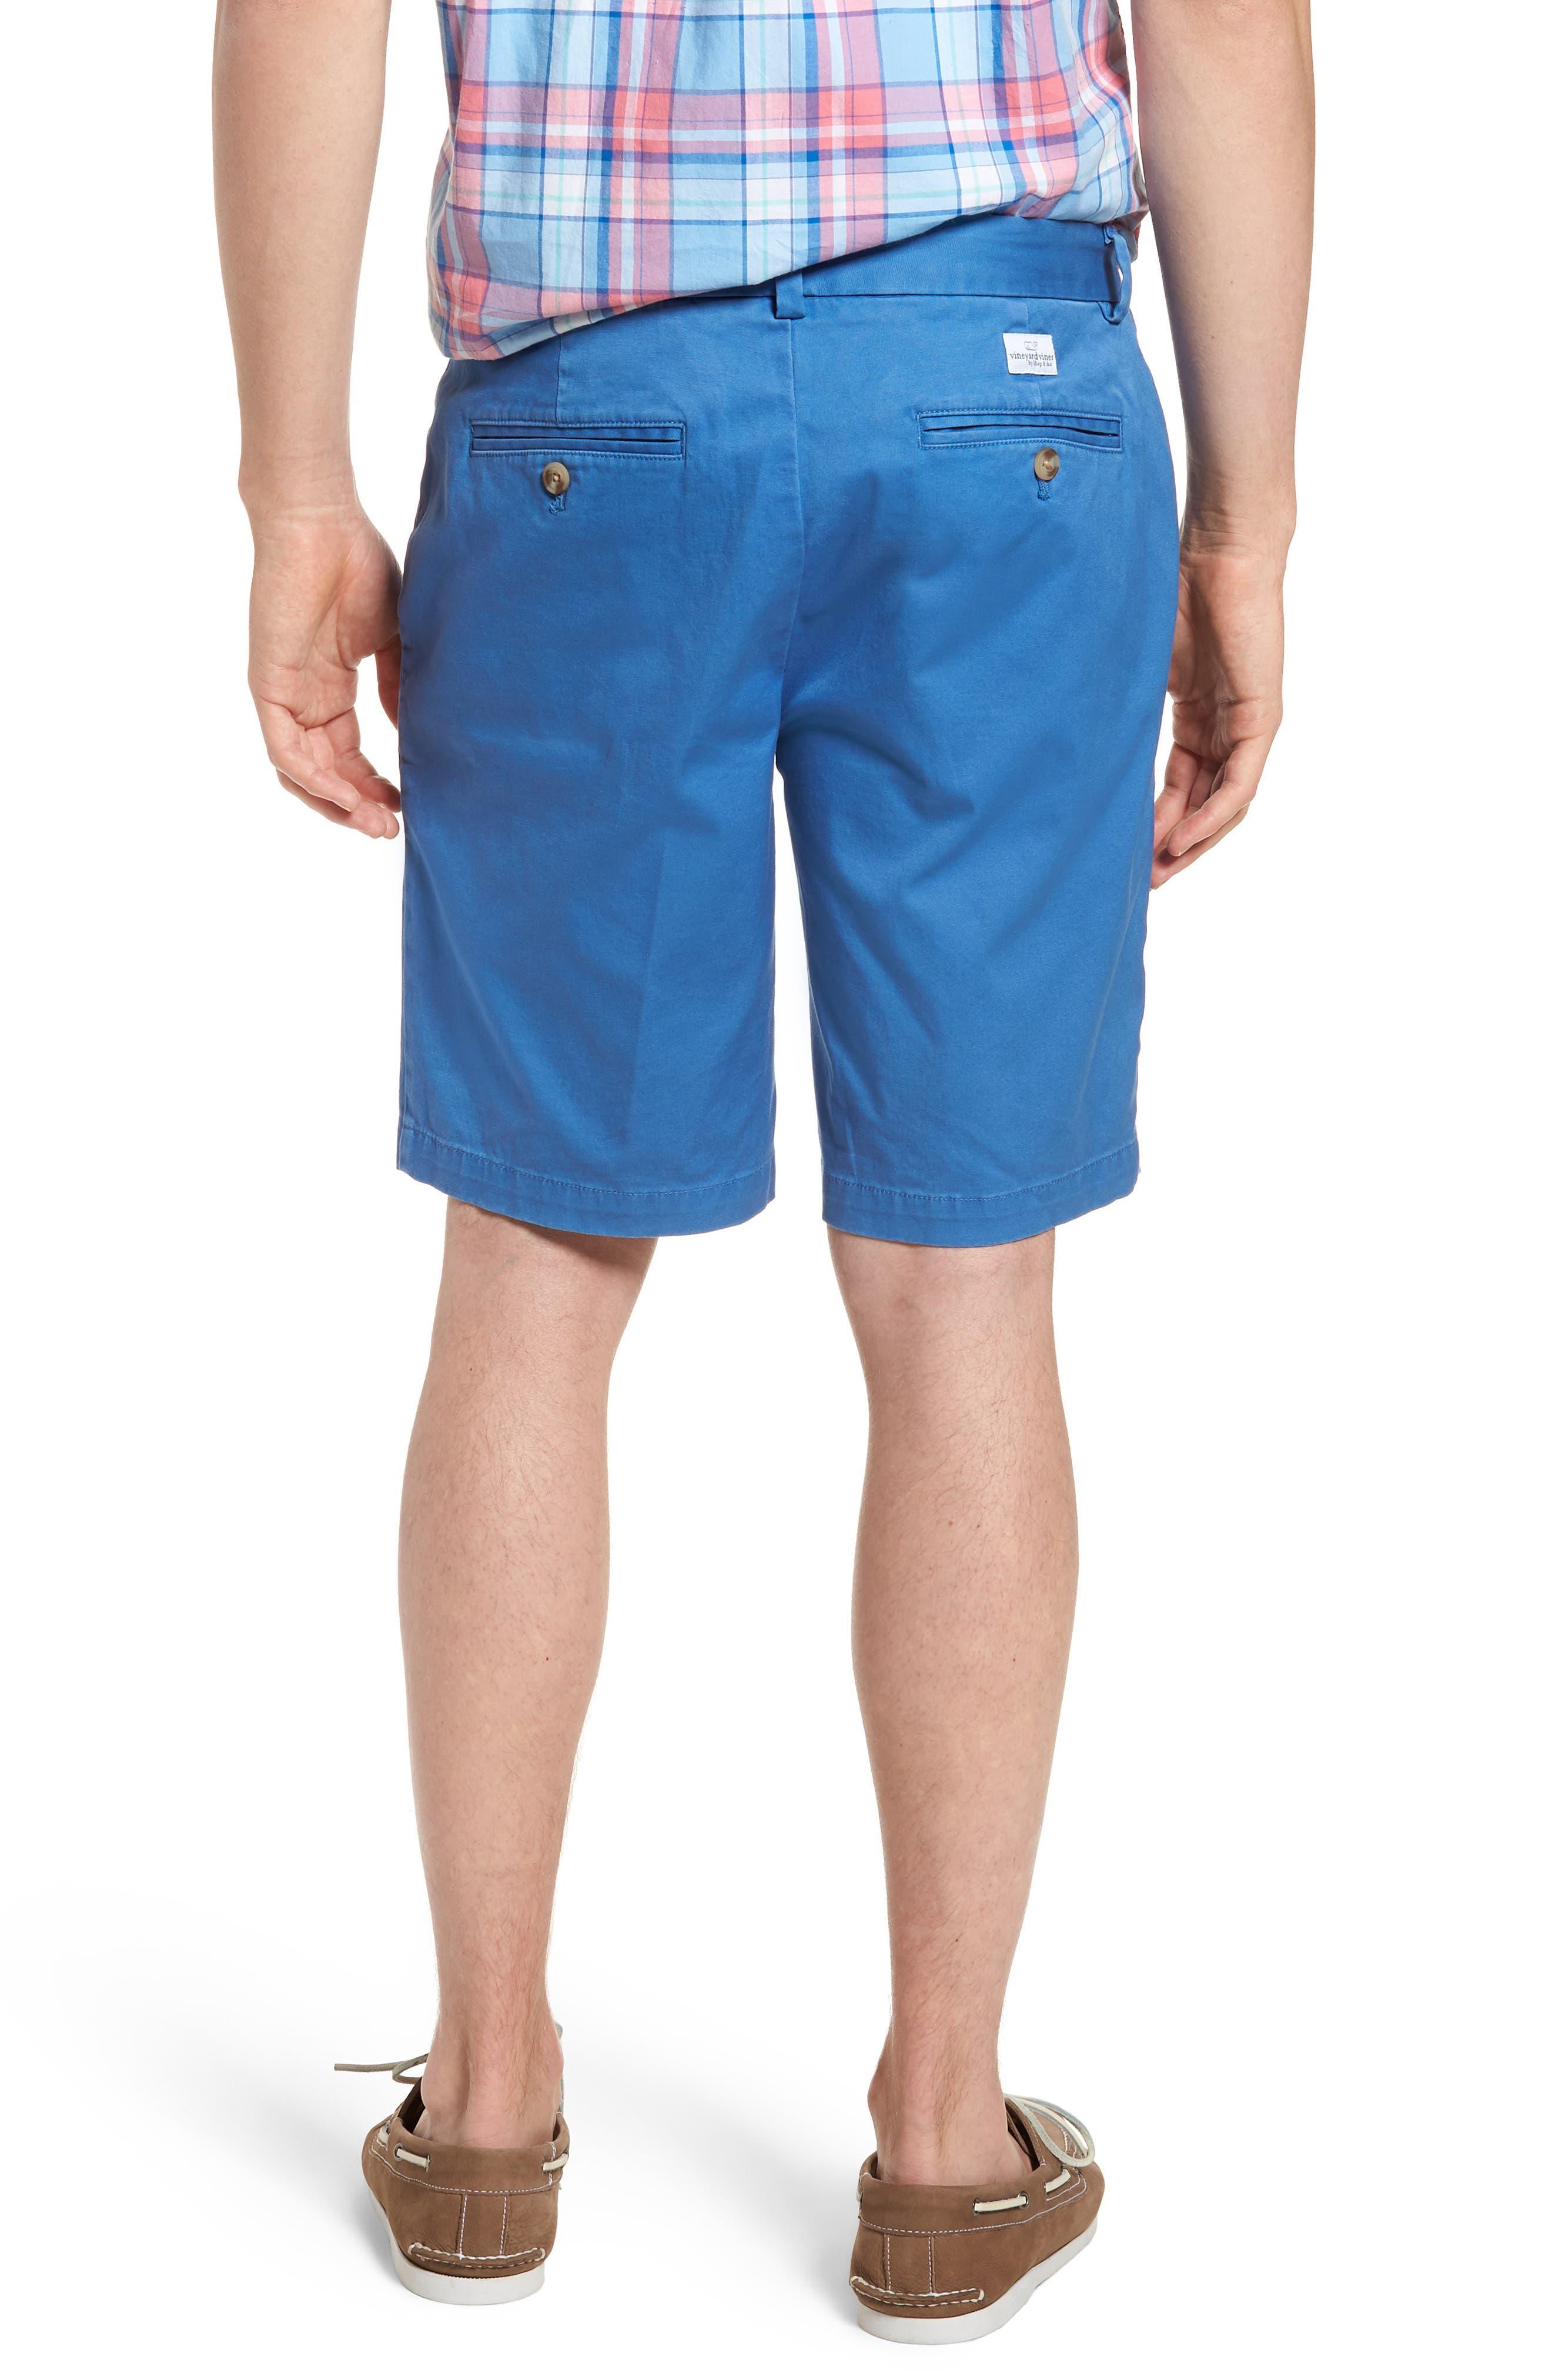 9 Inch Stretch Breaker Shorts,                             Alternate thumbnail 30, color,